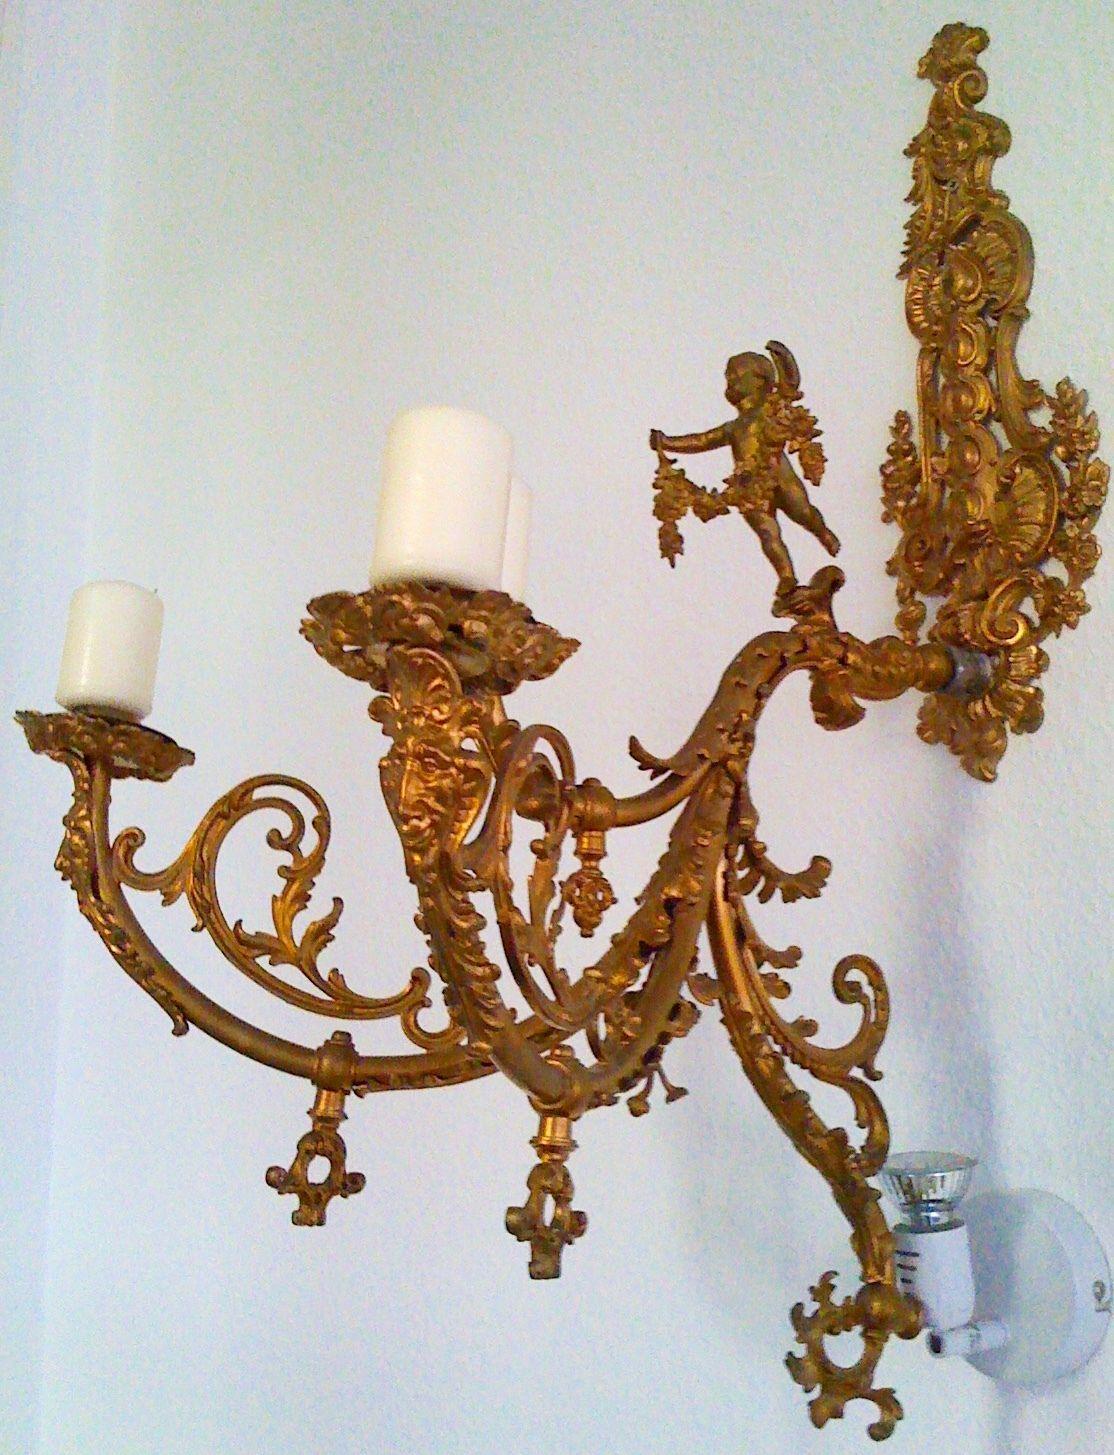 kronleuchter inkl 2 wand leuchtern lster saal lampe antik barock gold in - Kronleuchter Wand